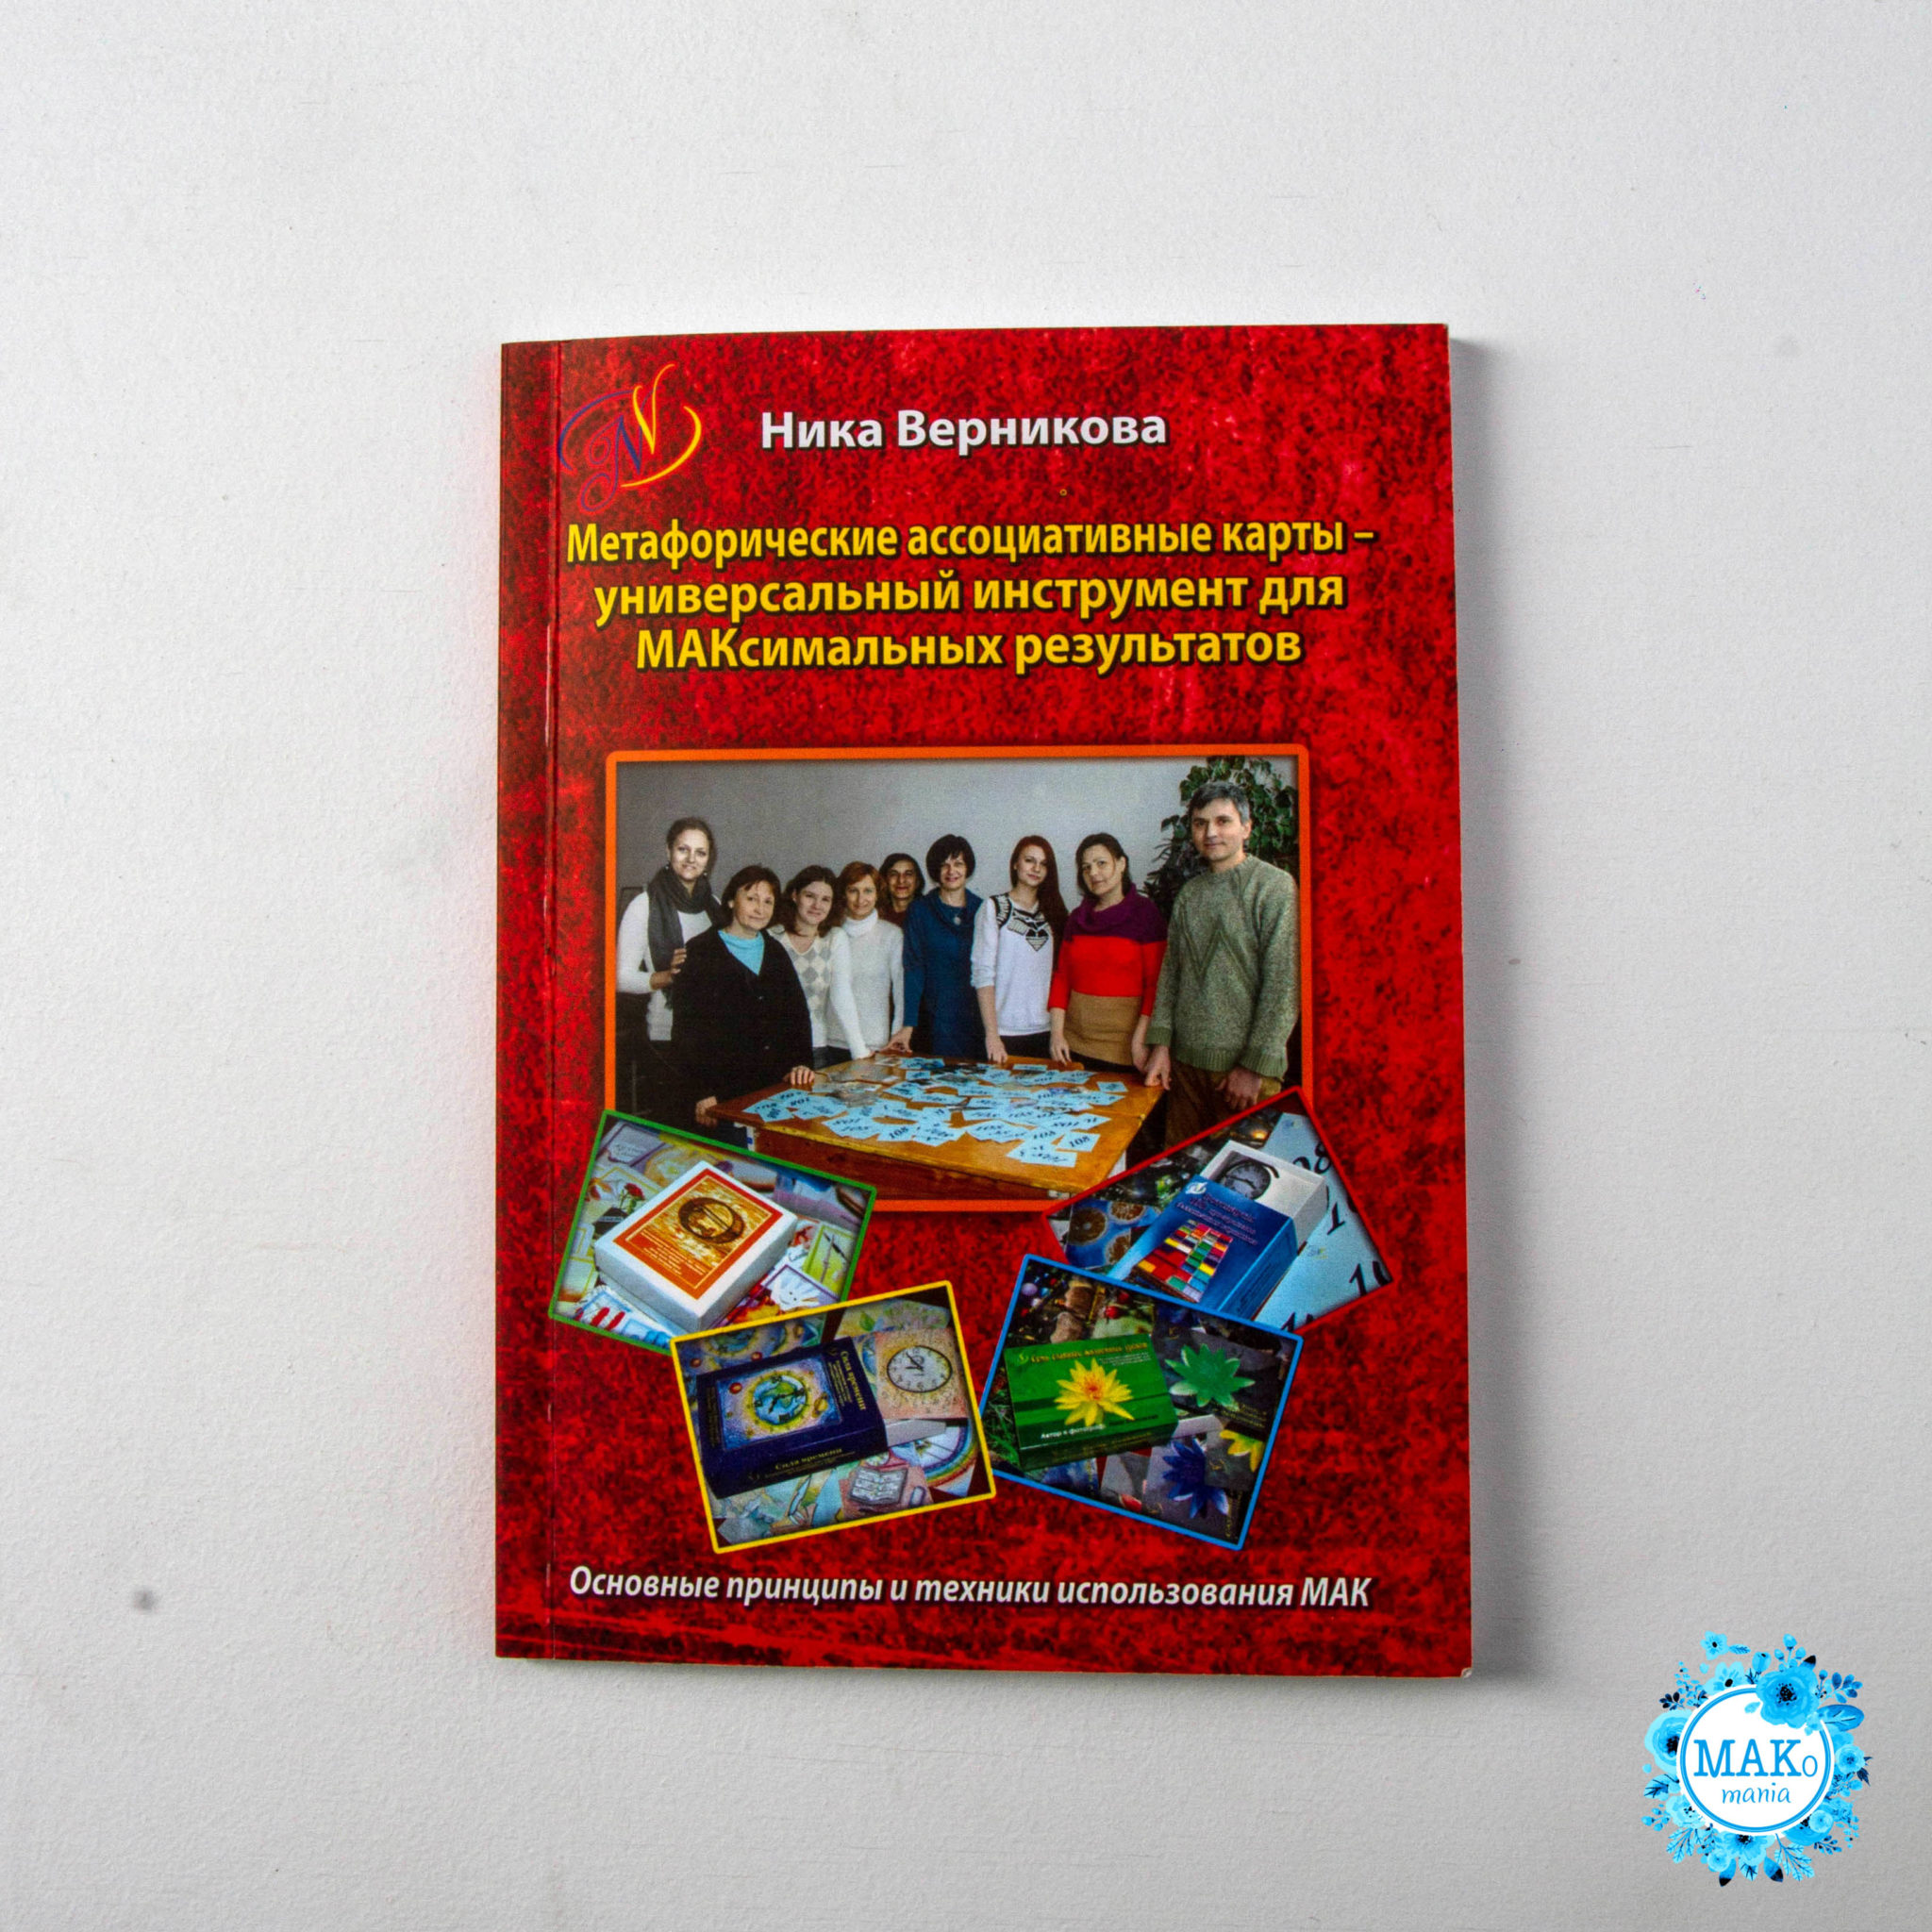 книги МАК,интернет-магазин МАК